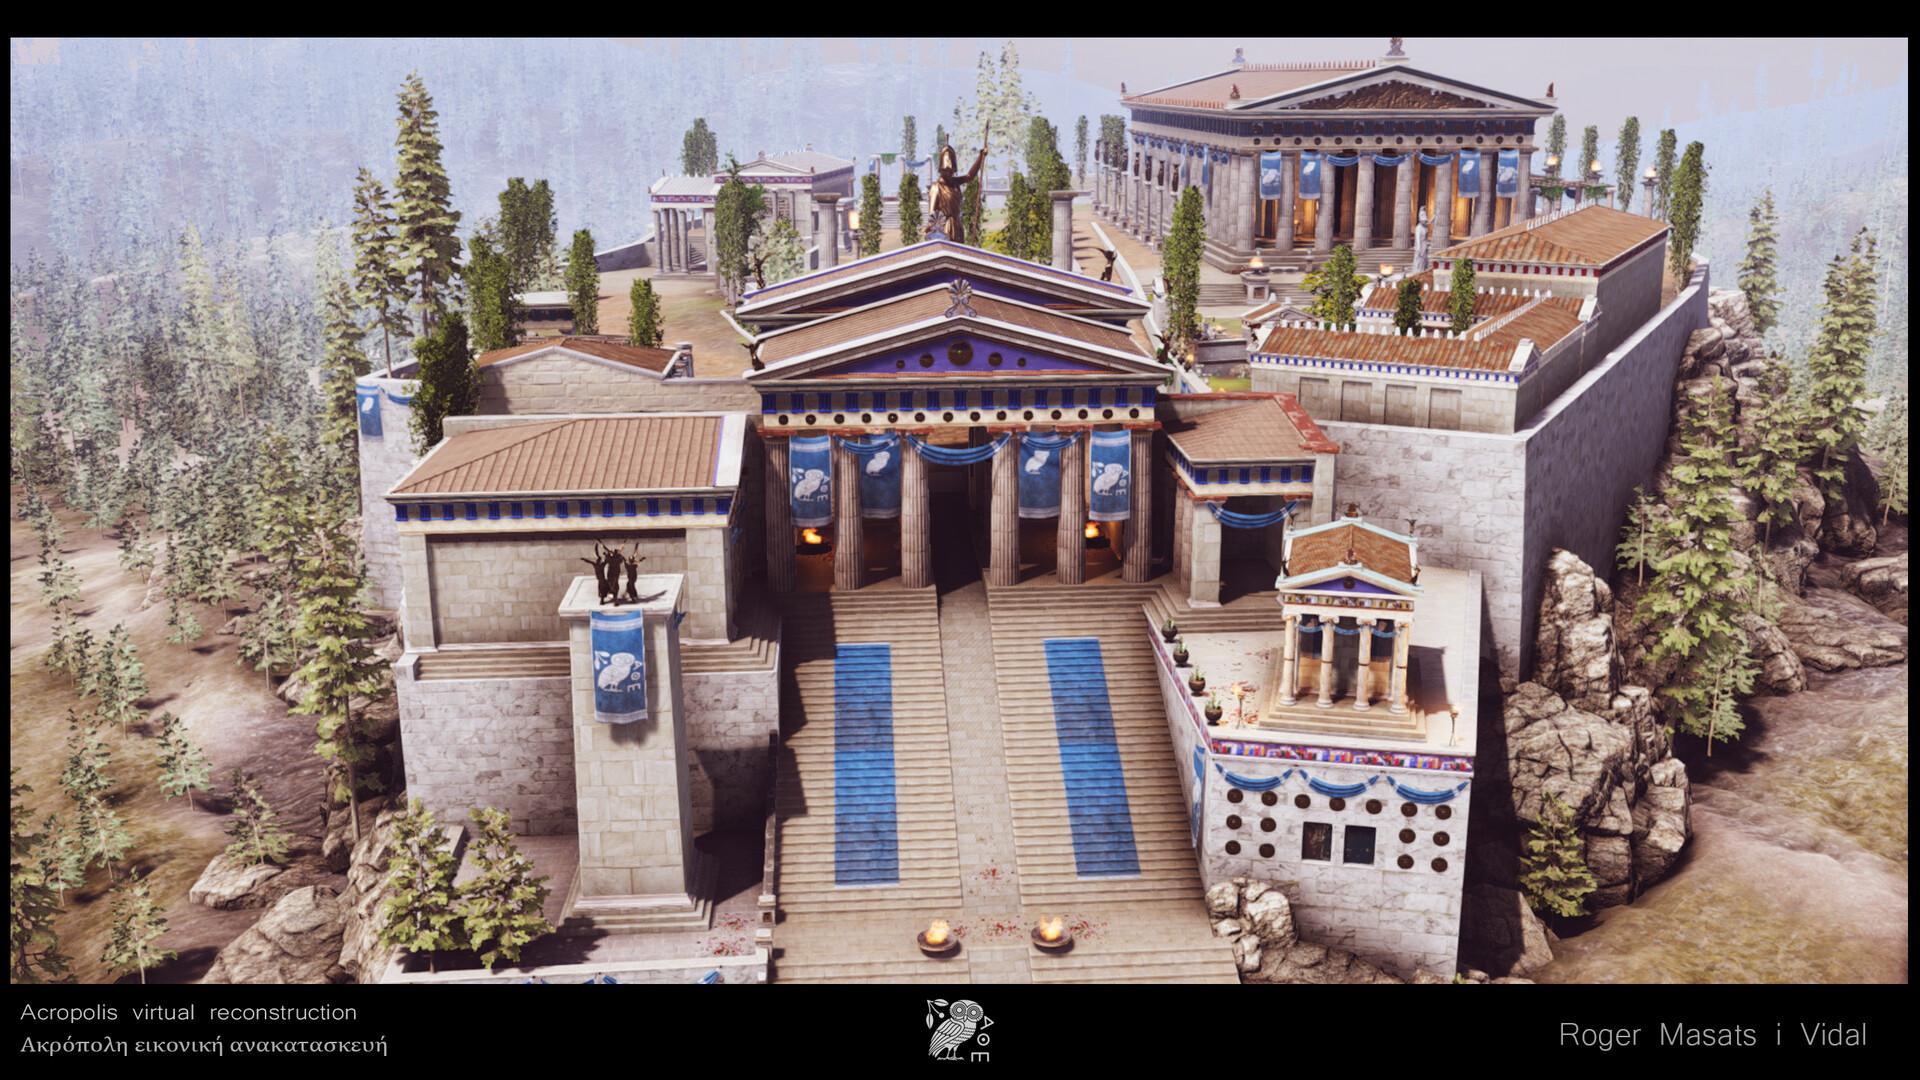 Propylaea and Acropolis